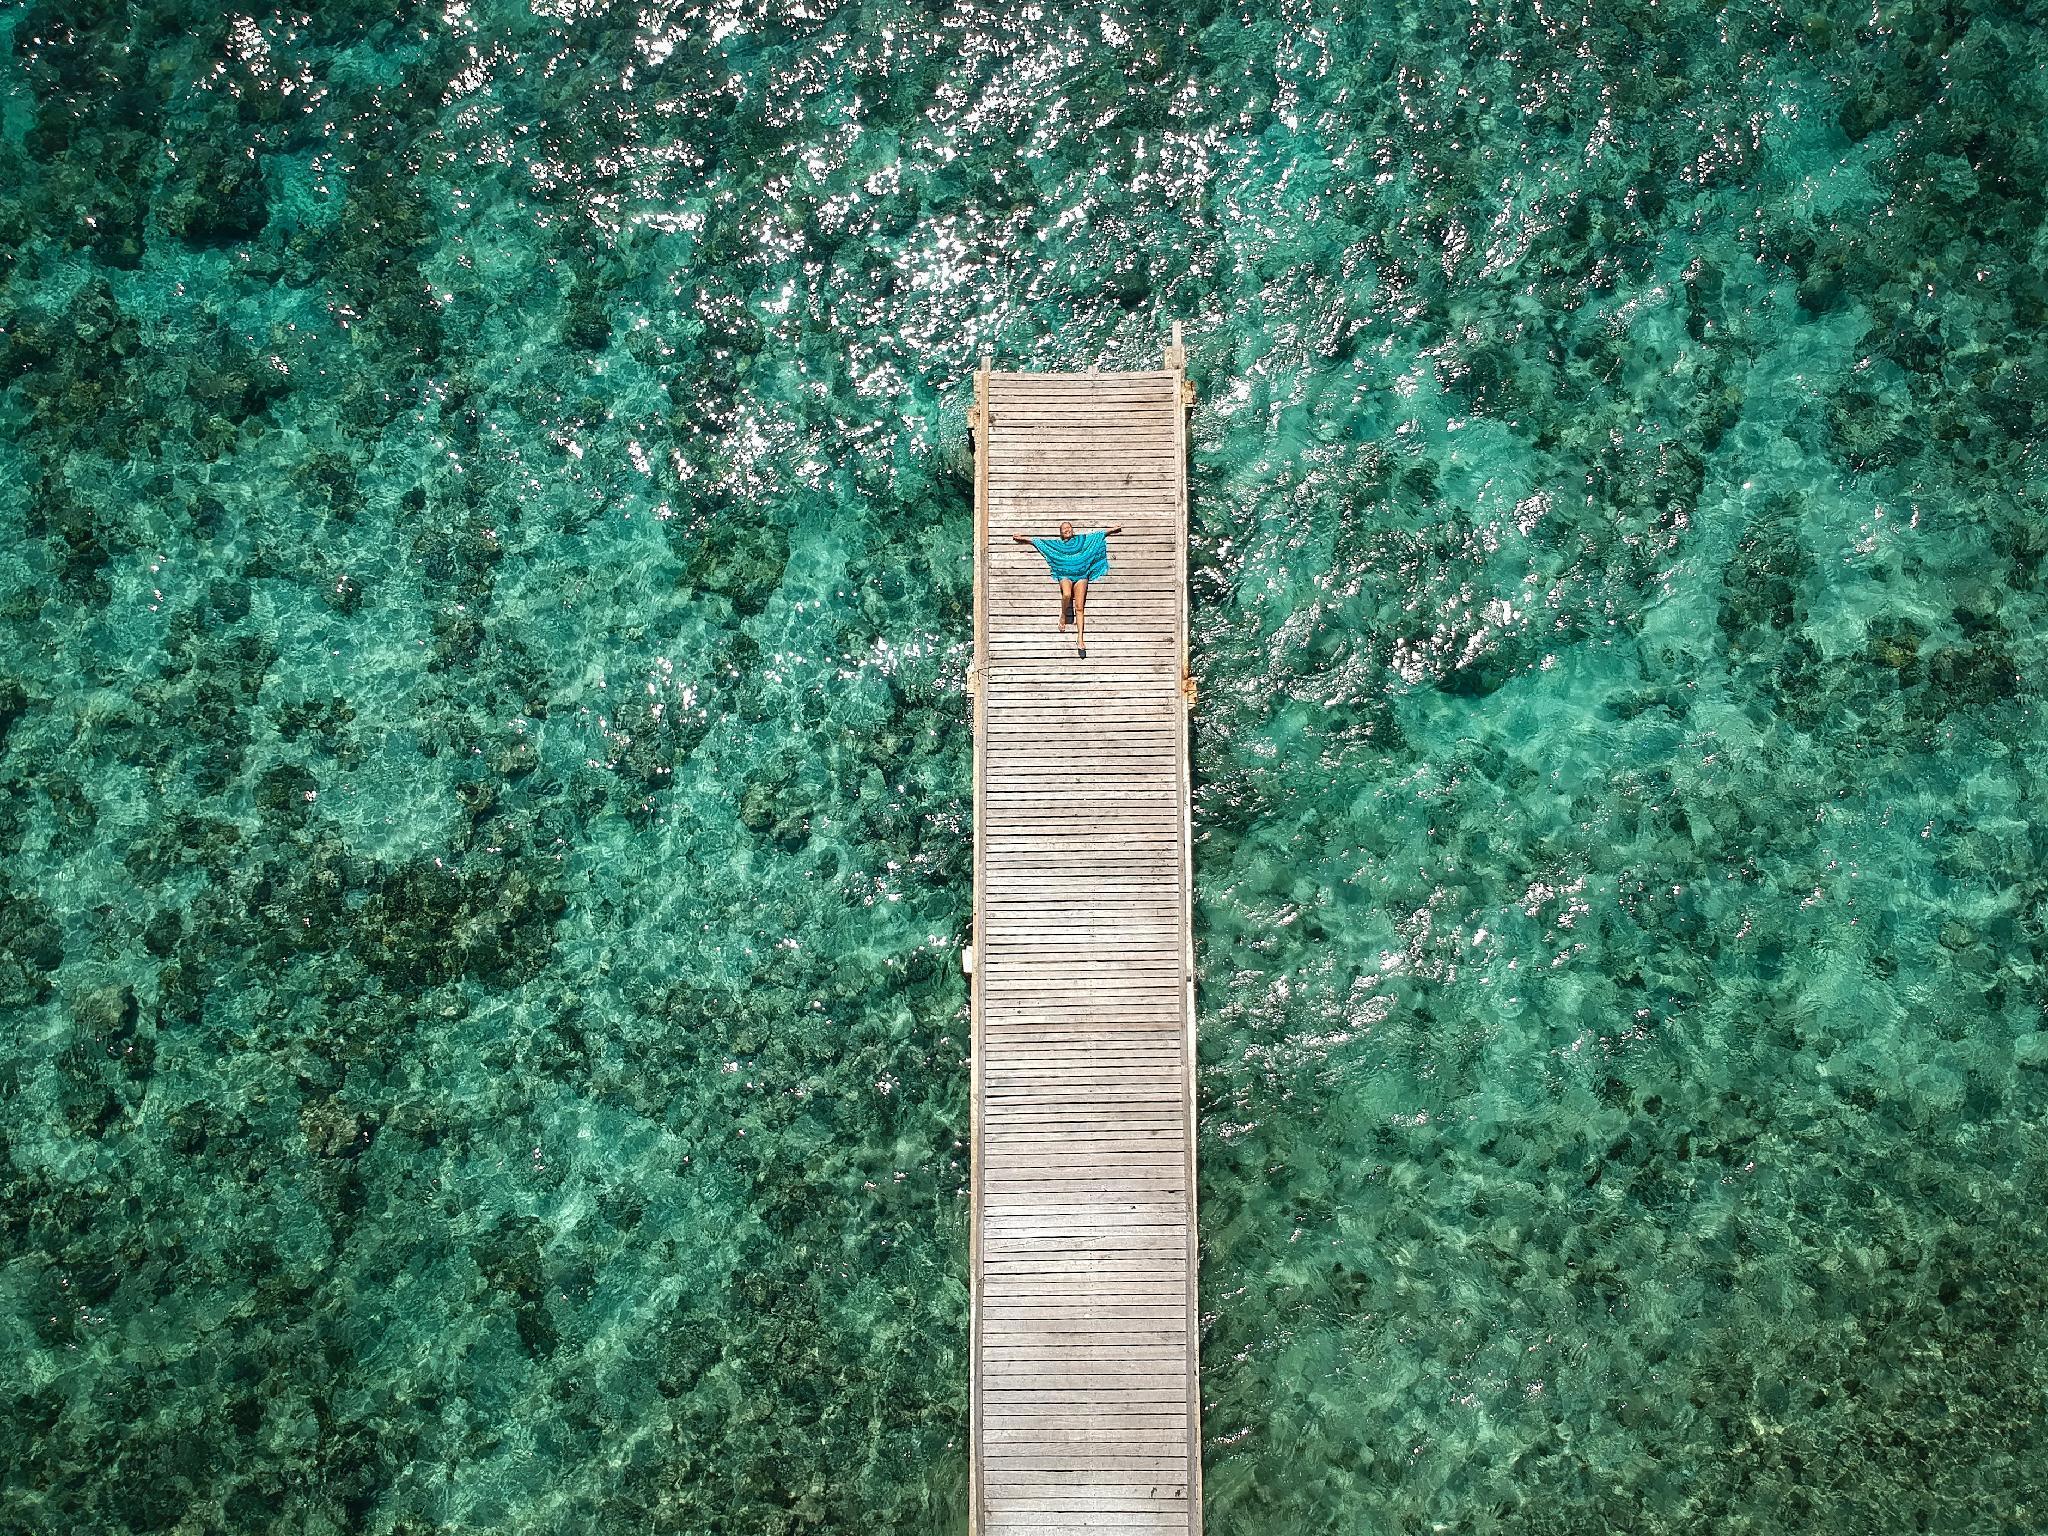 Blue EmOcean